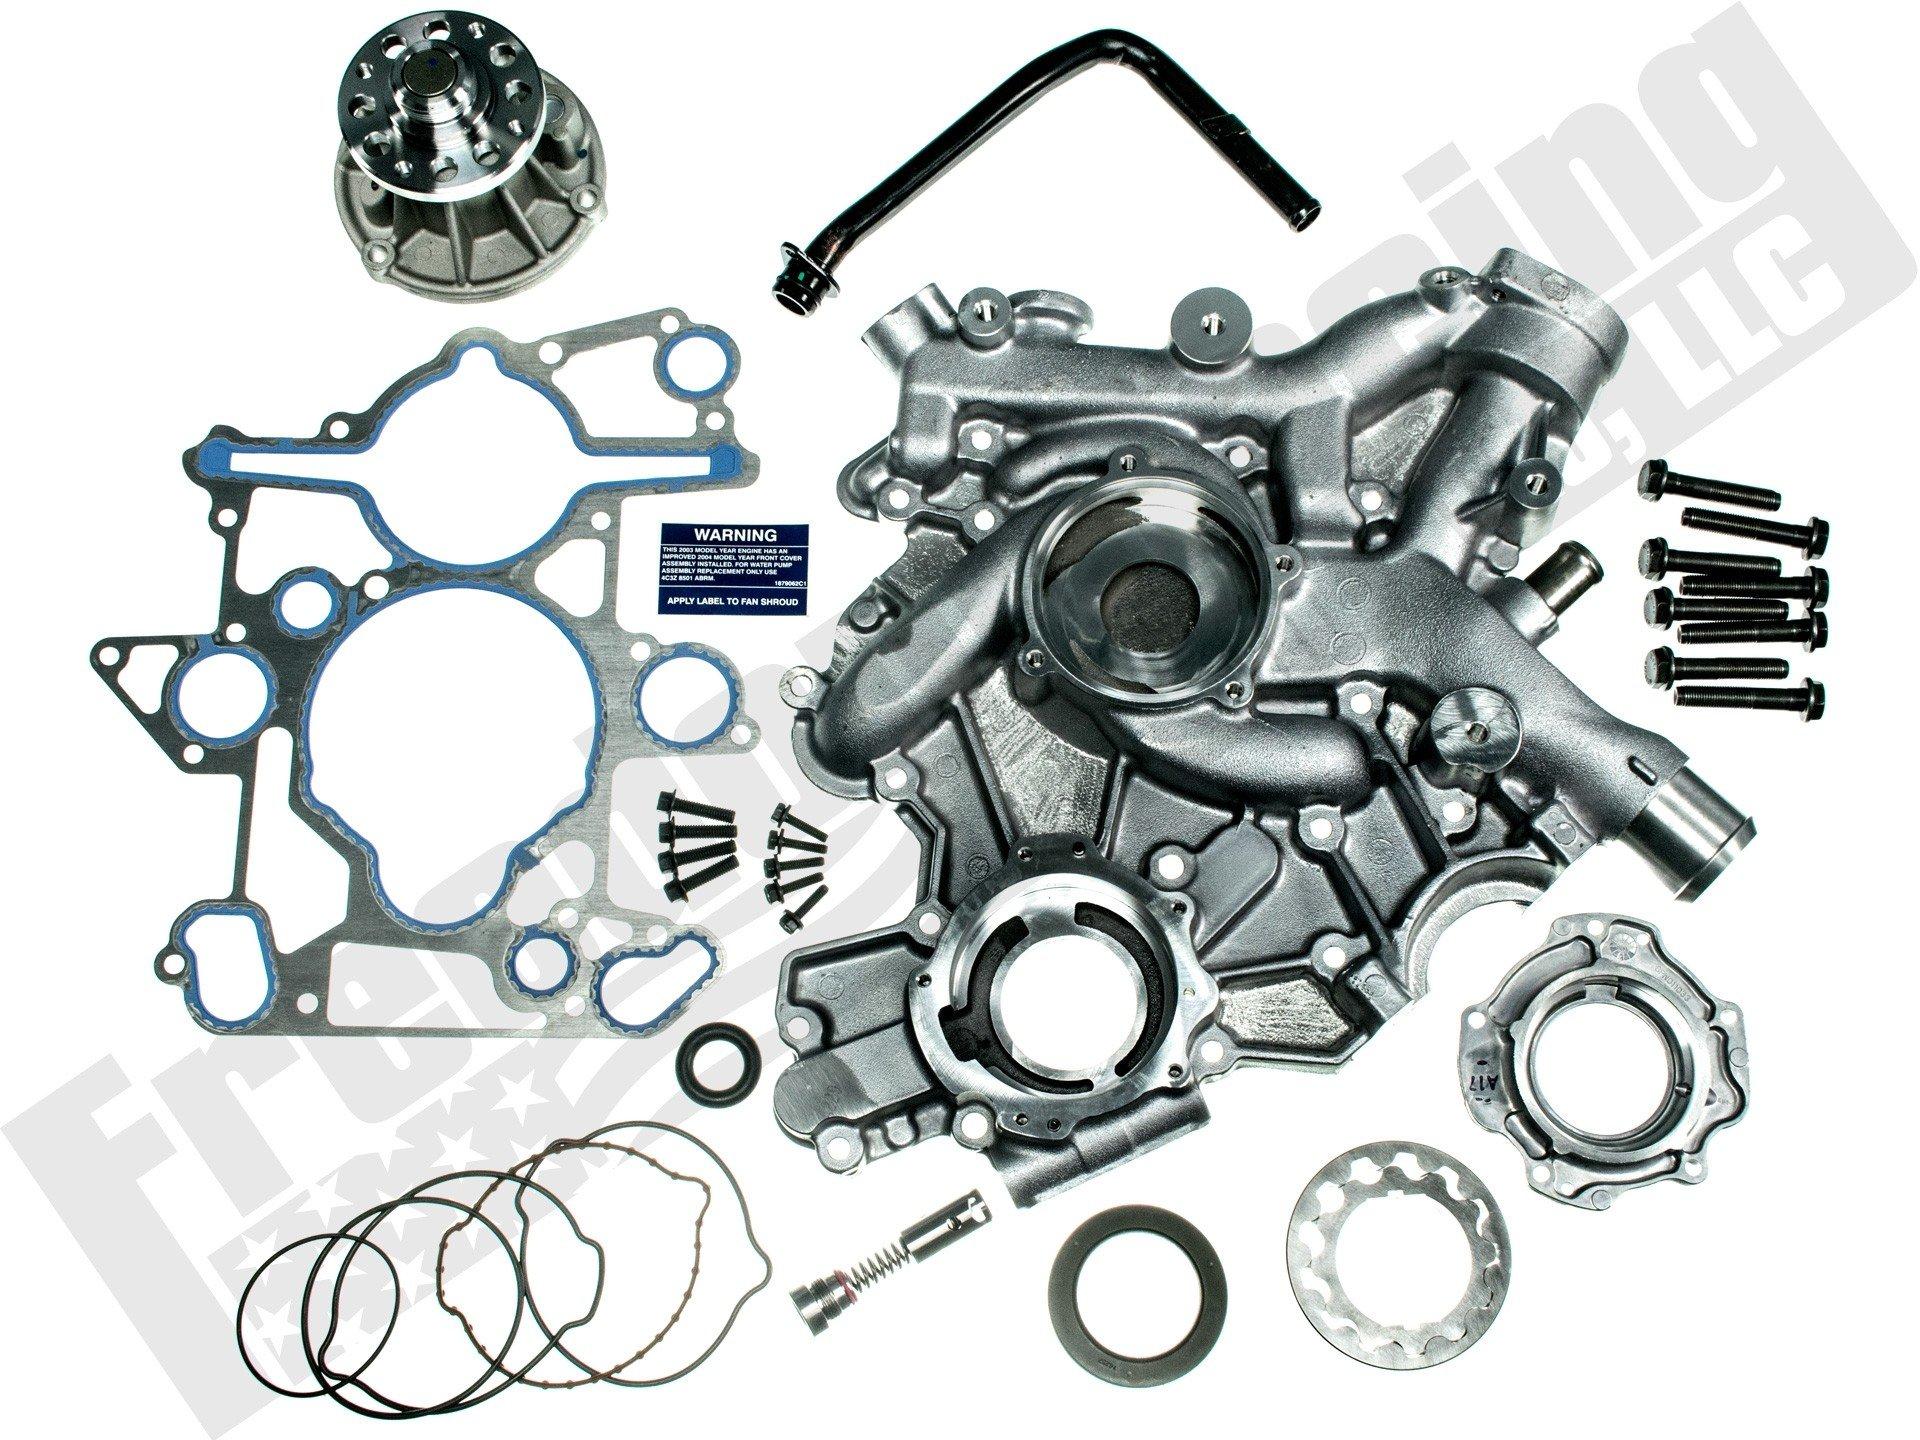 60l Front Cover And Low Pressure Oil Pump Kit 3c3z 6608 B 1998 Jaguar Engine Diagram